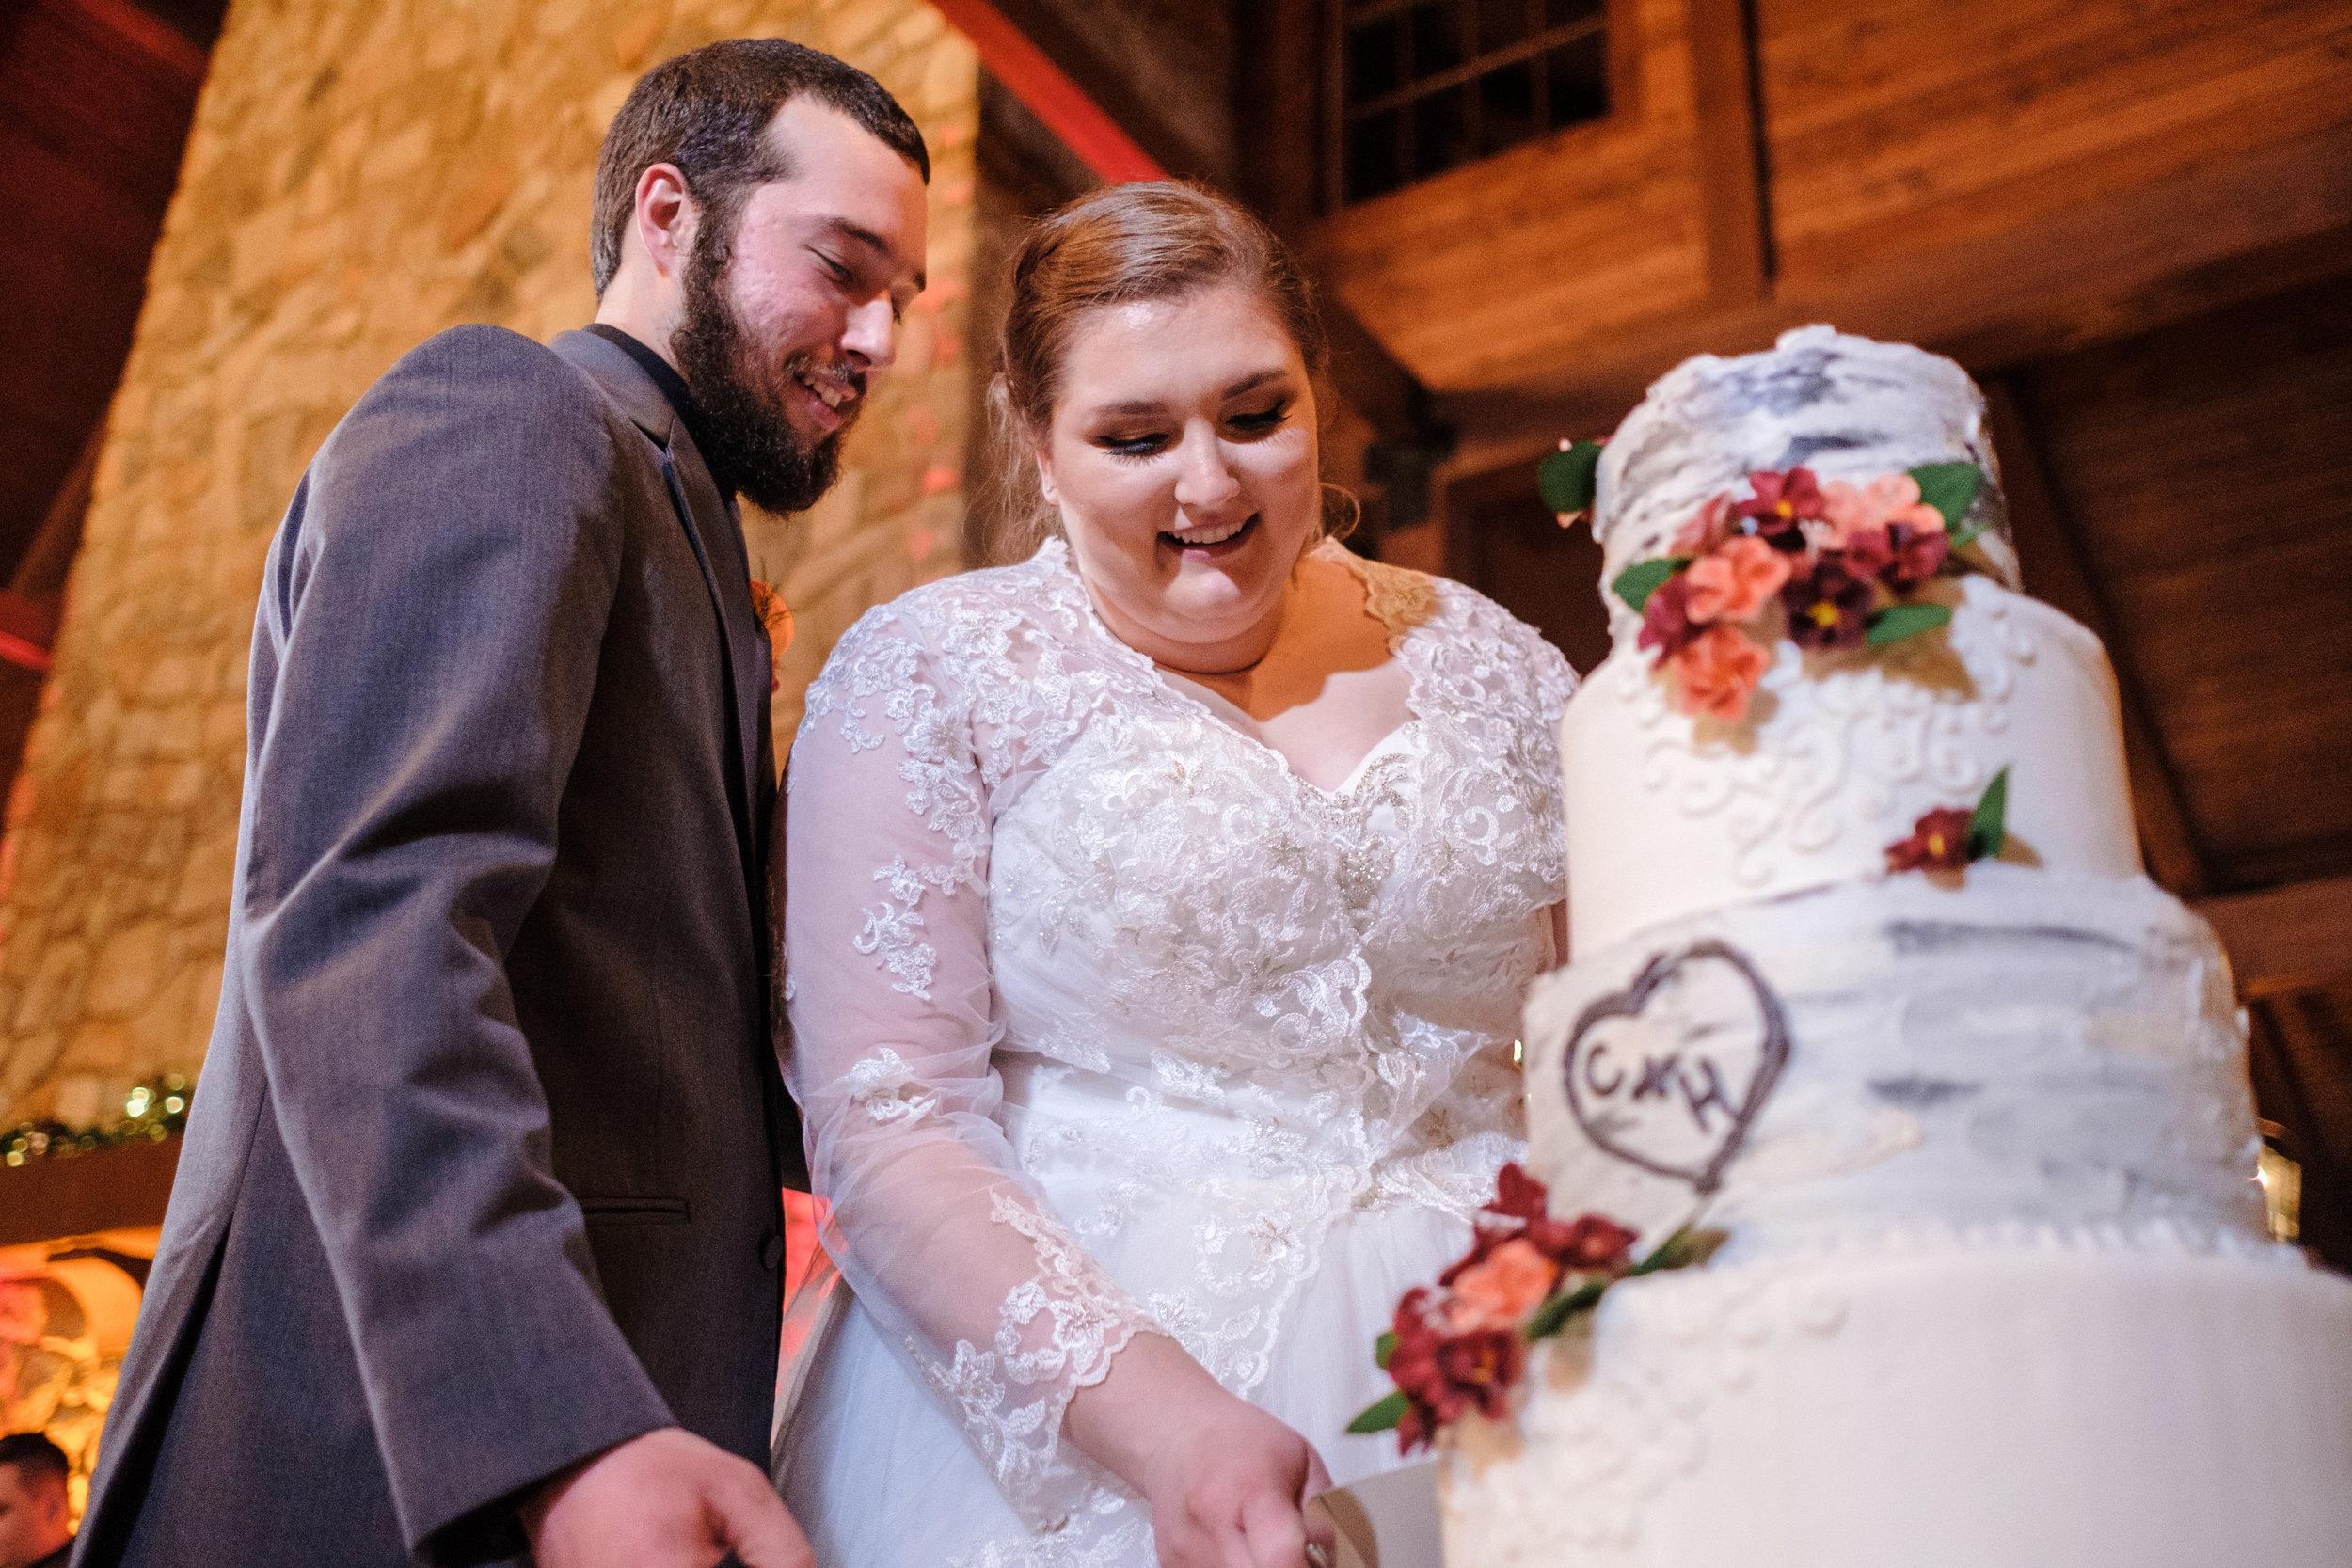 18-12-28 Corinne-Henry-Pavilion-Wedding-452.jpg